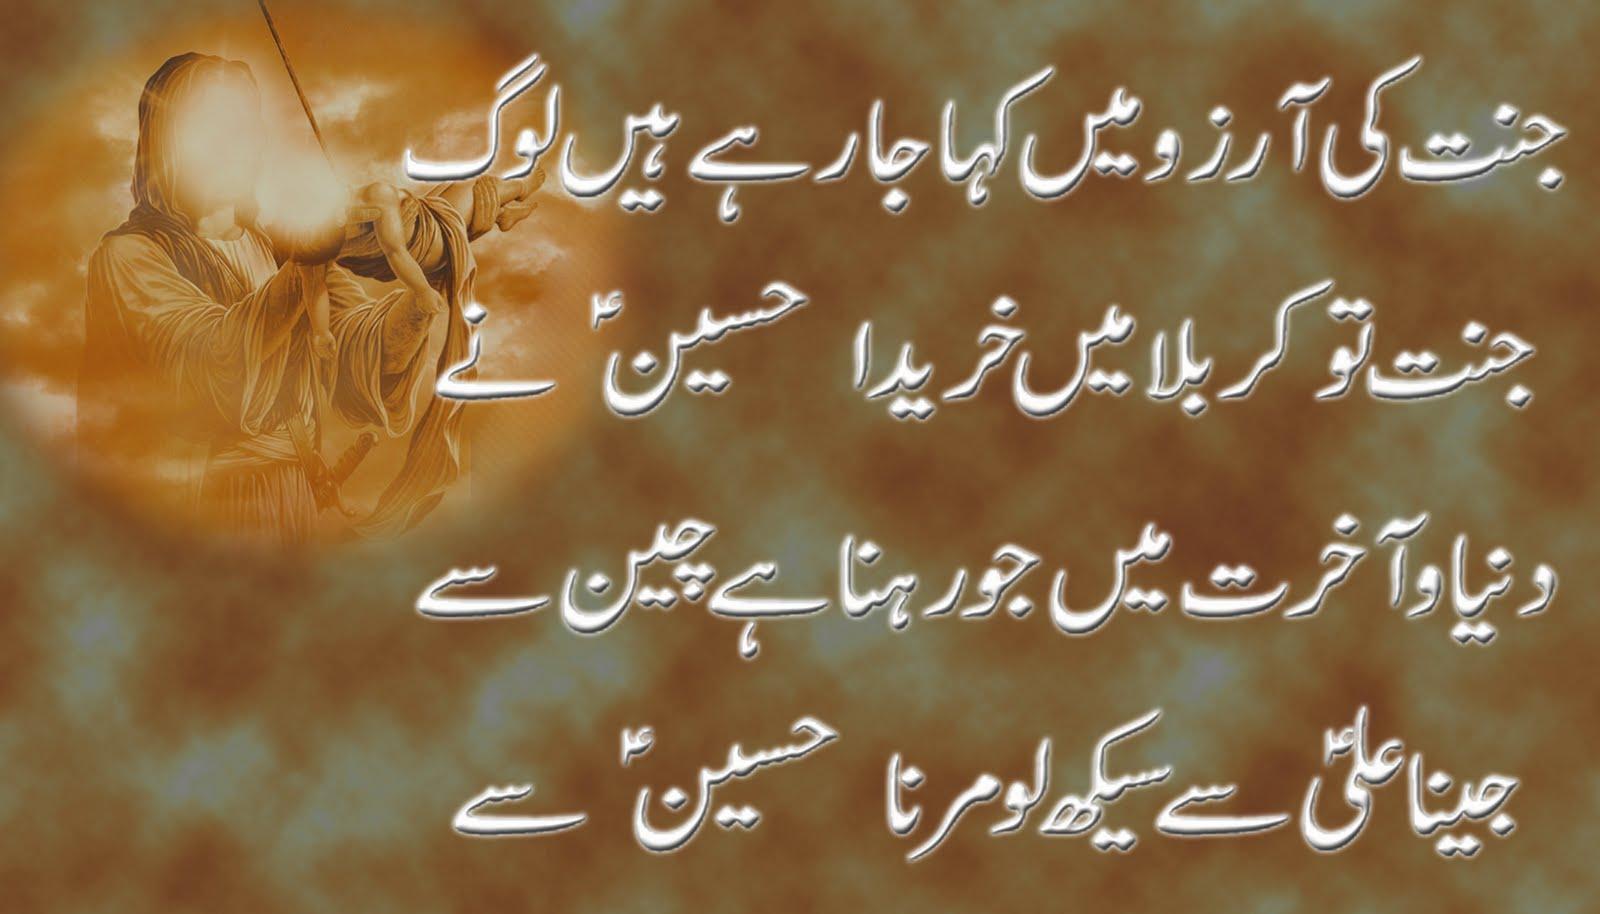 Muharram Messages In Urdu